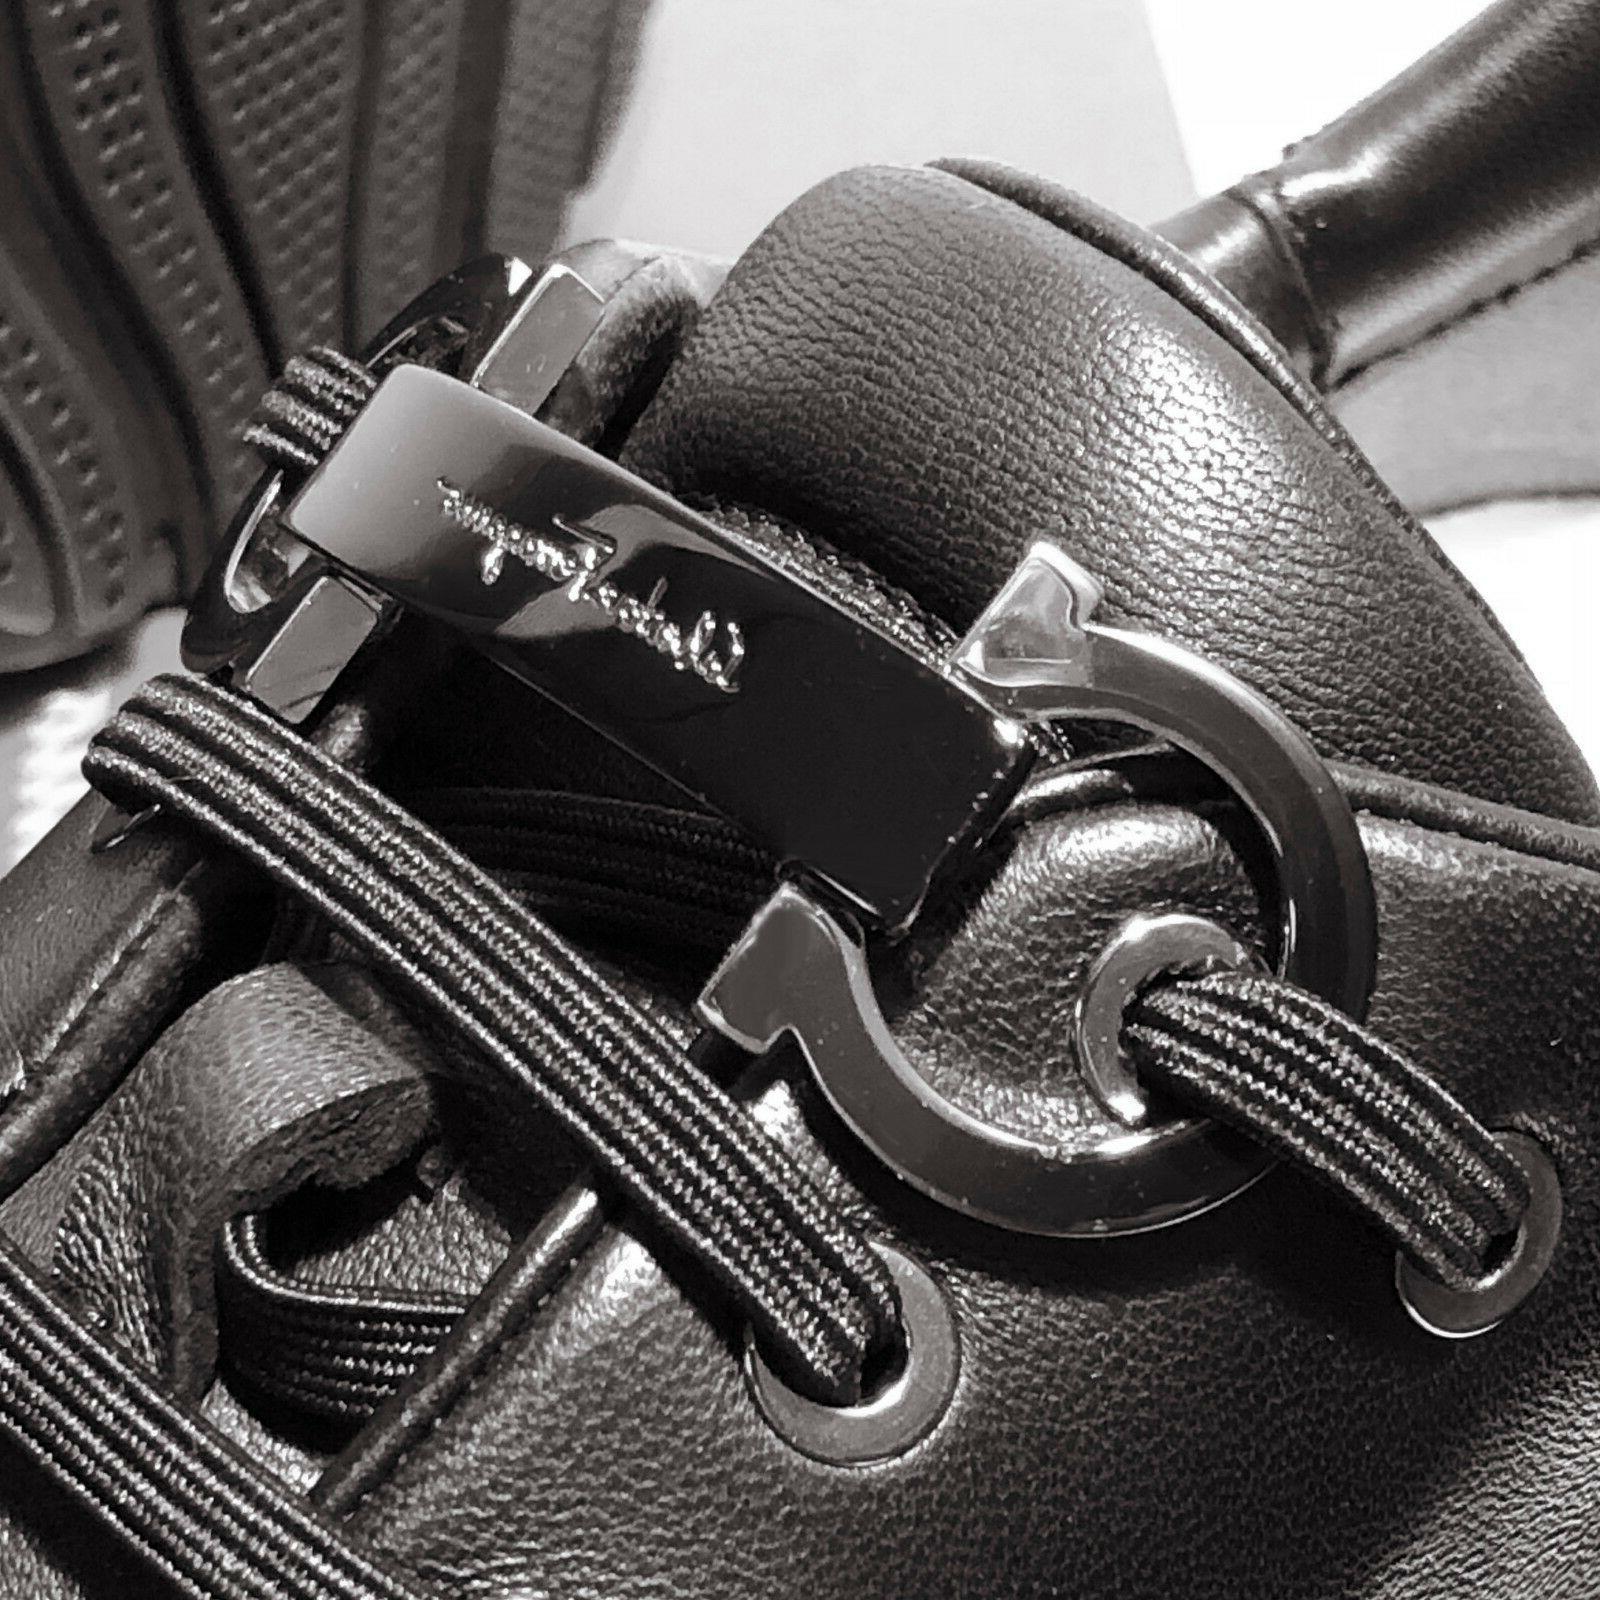 NEW Ferragamo FLUSHING Napa Leather Fashion Gancini Sneakers